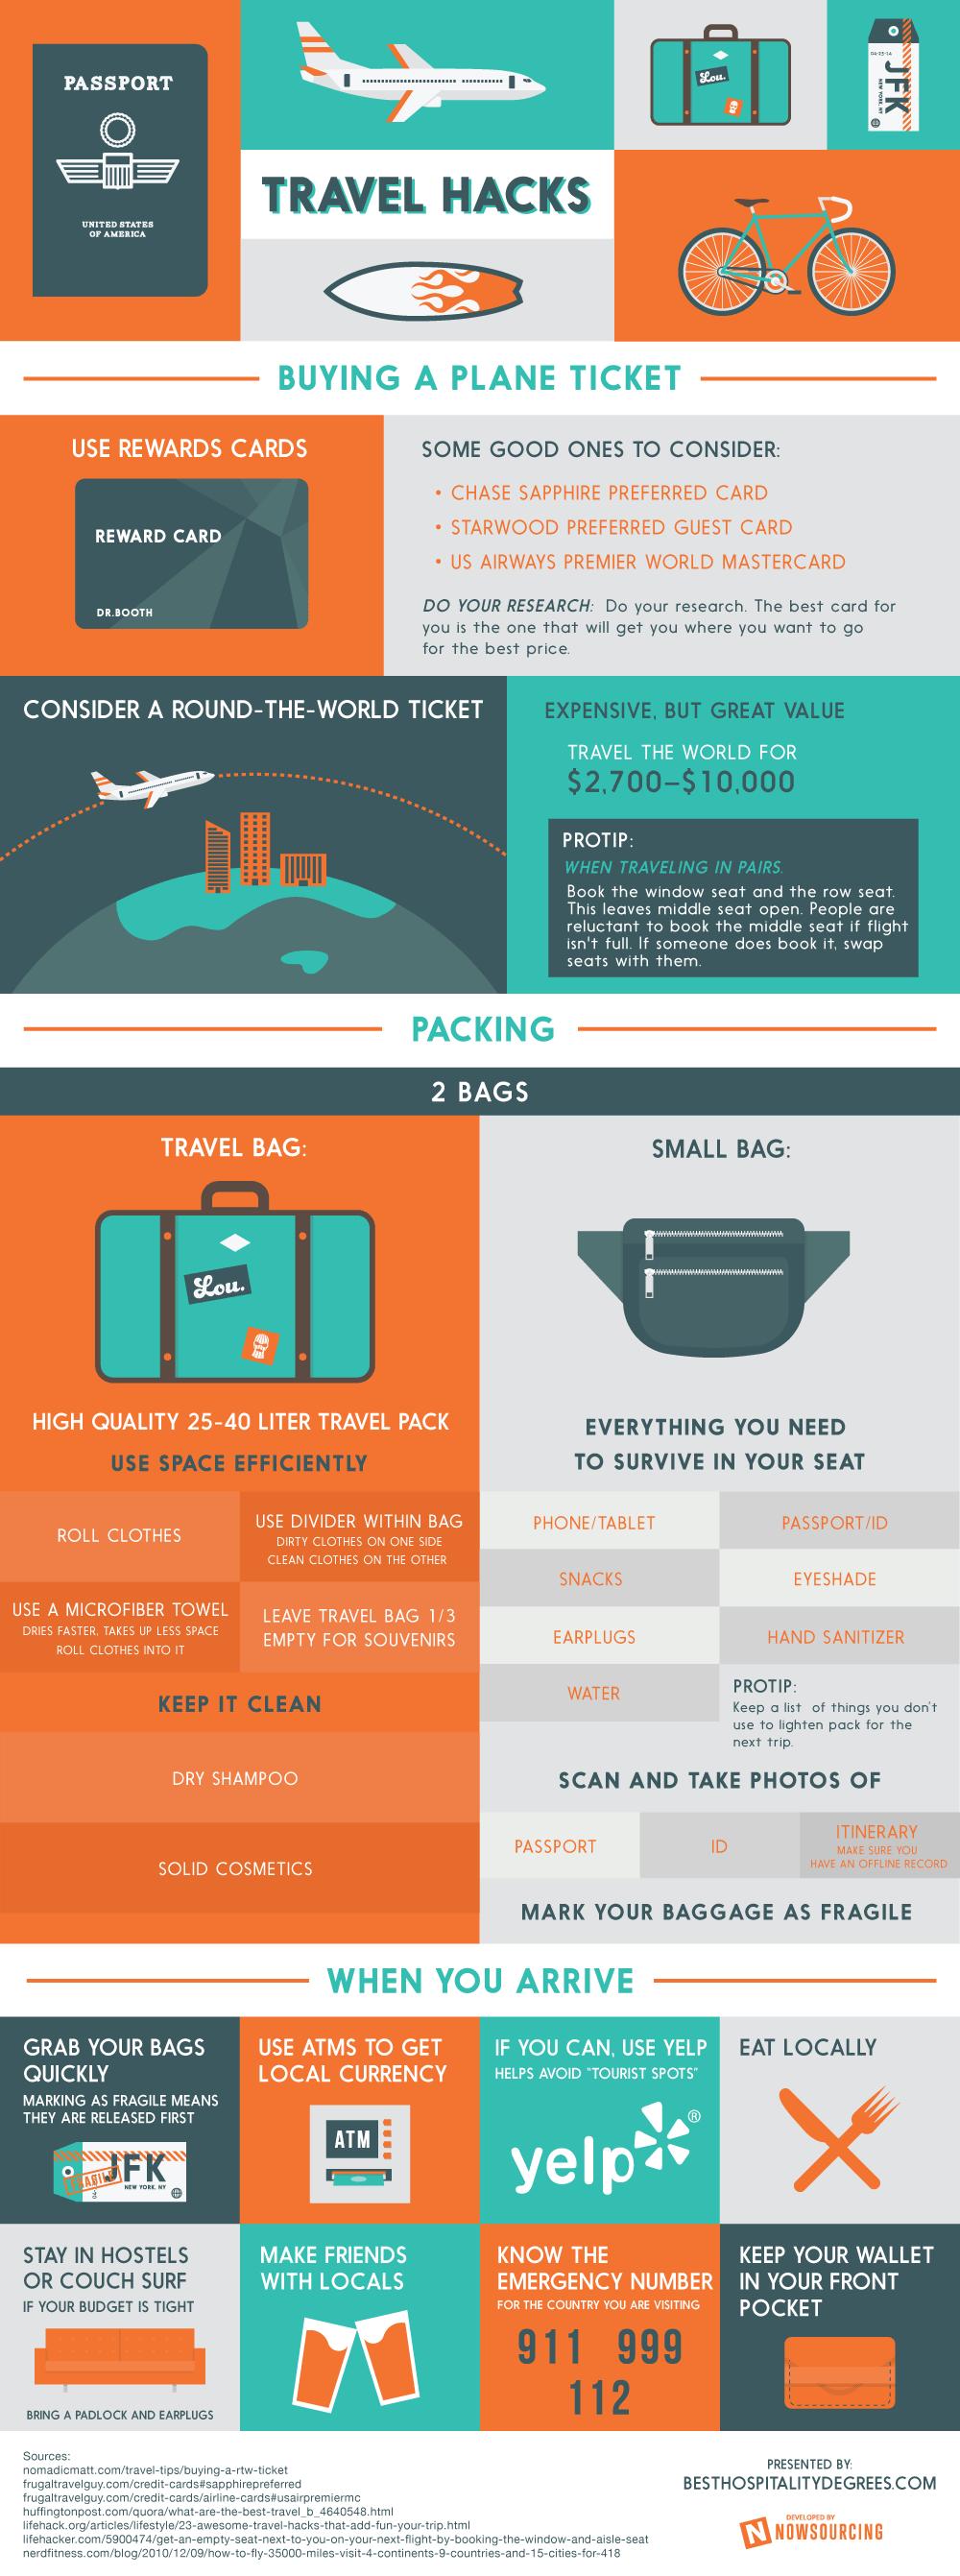 infographic-travel-hacks